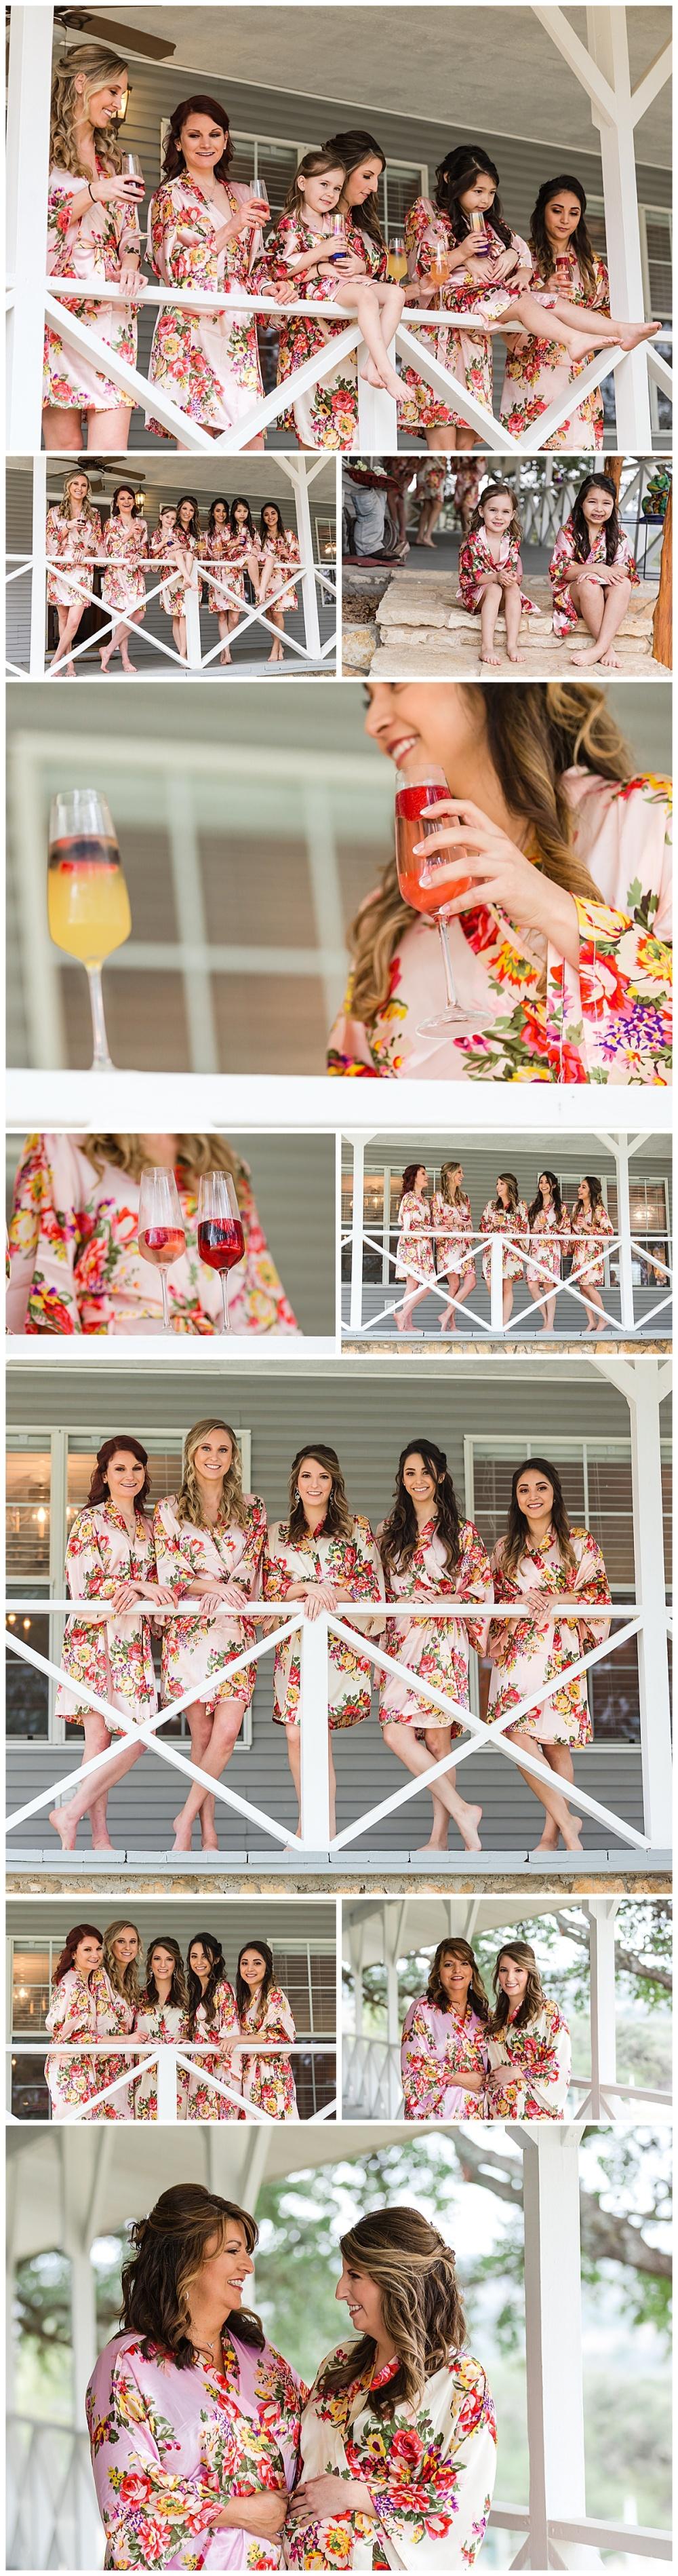 Wedding-Photographer-Texas-Hill-Country-Happy-H-Ranch-Comfor-Texas-Carly-Barton-Photography_0011.jpg